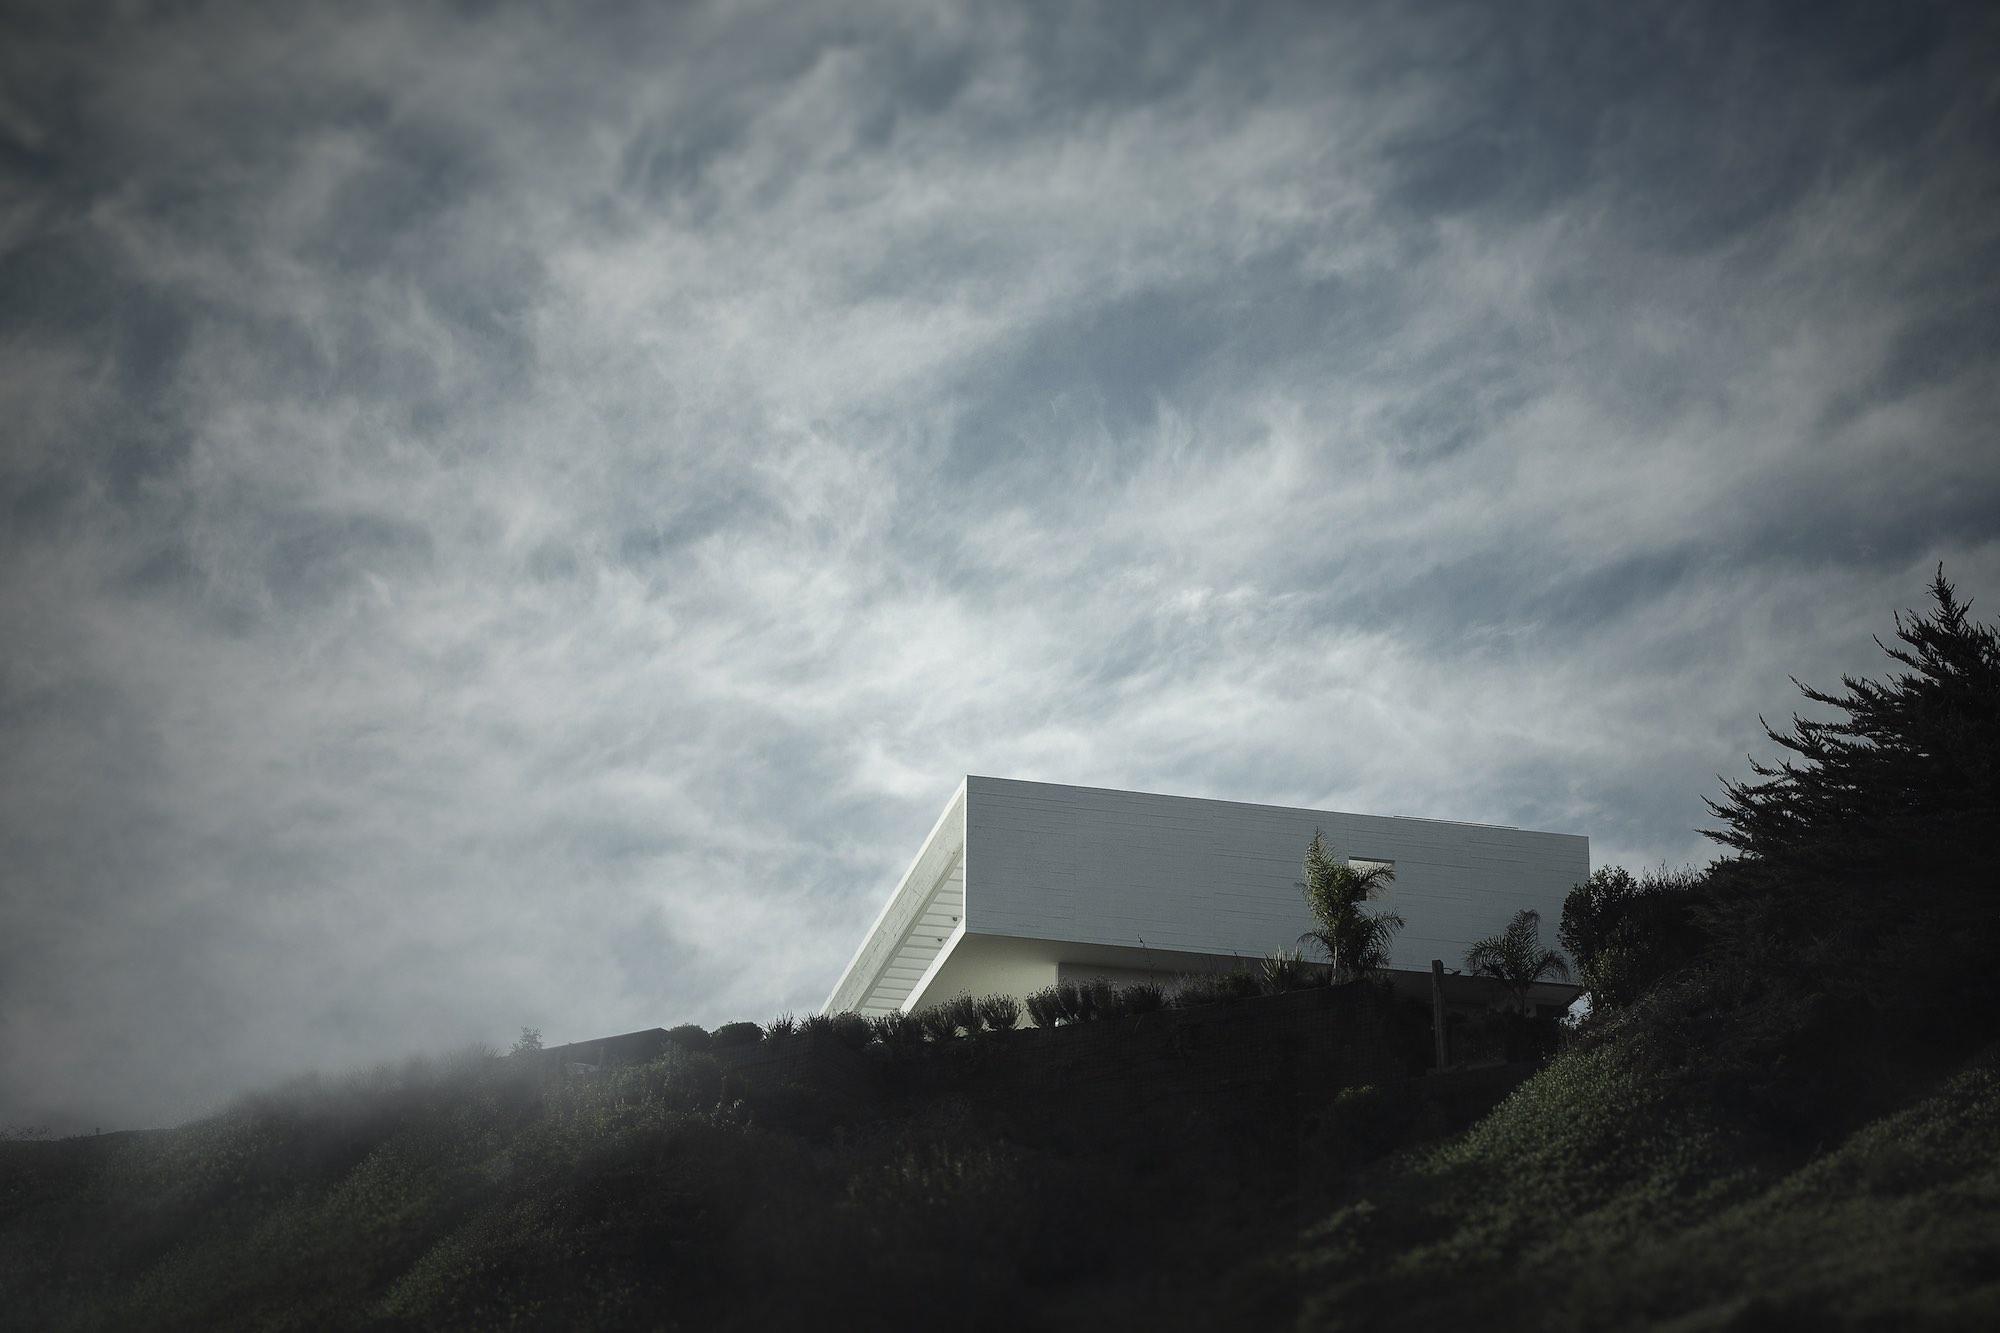 AV House designed by Cristián Romero Valente